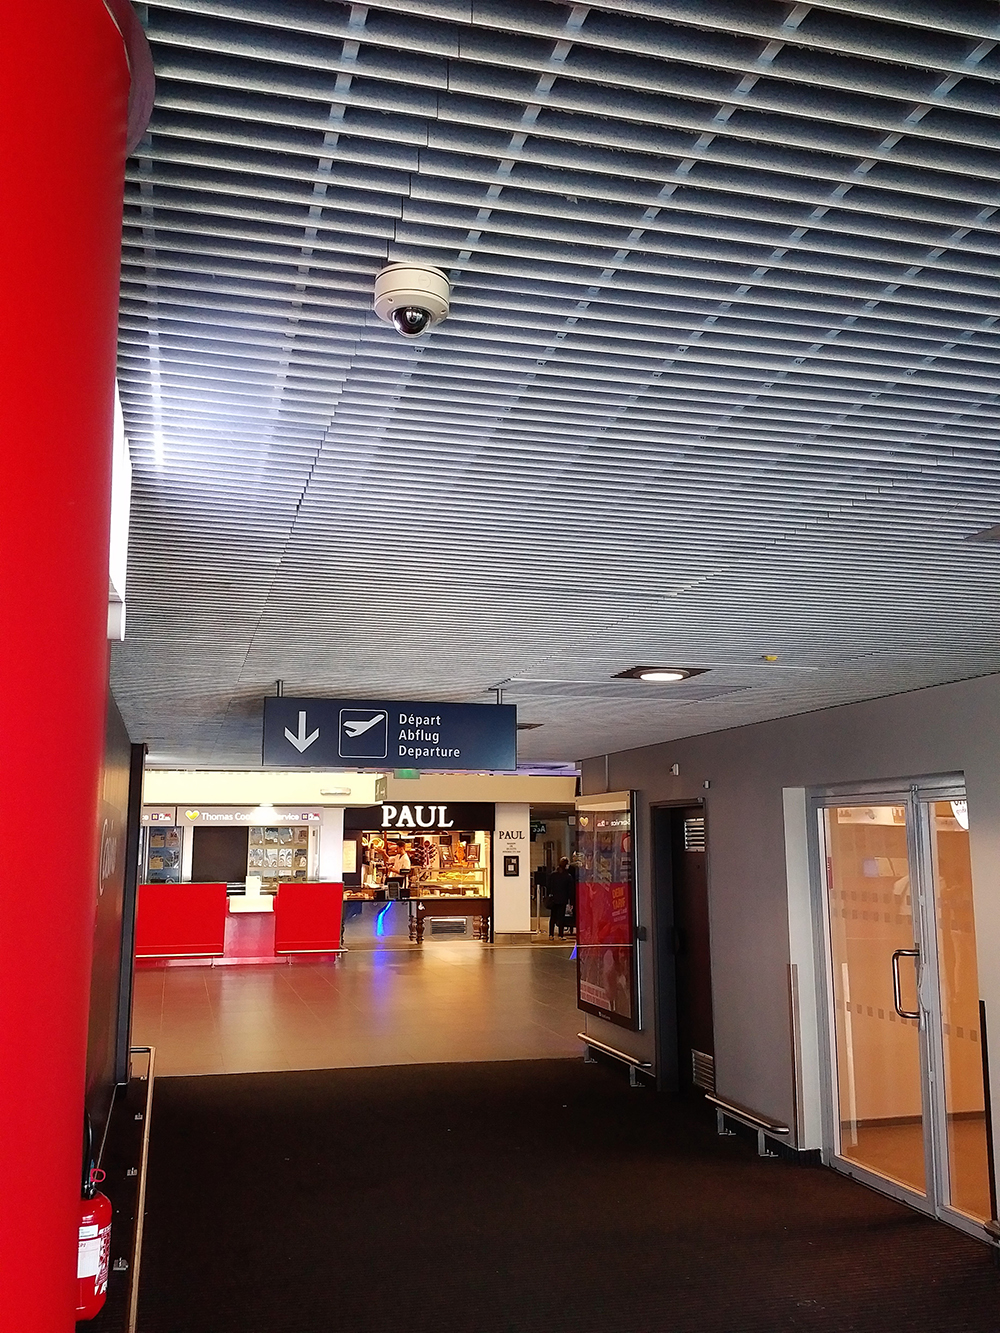 EuroAirport, Saint-Louis, France